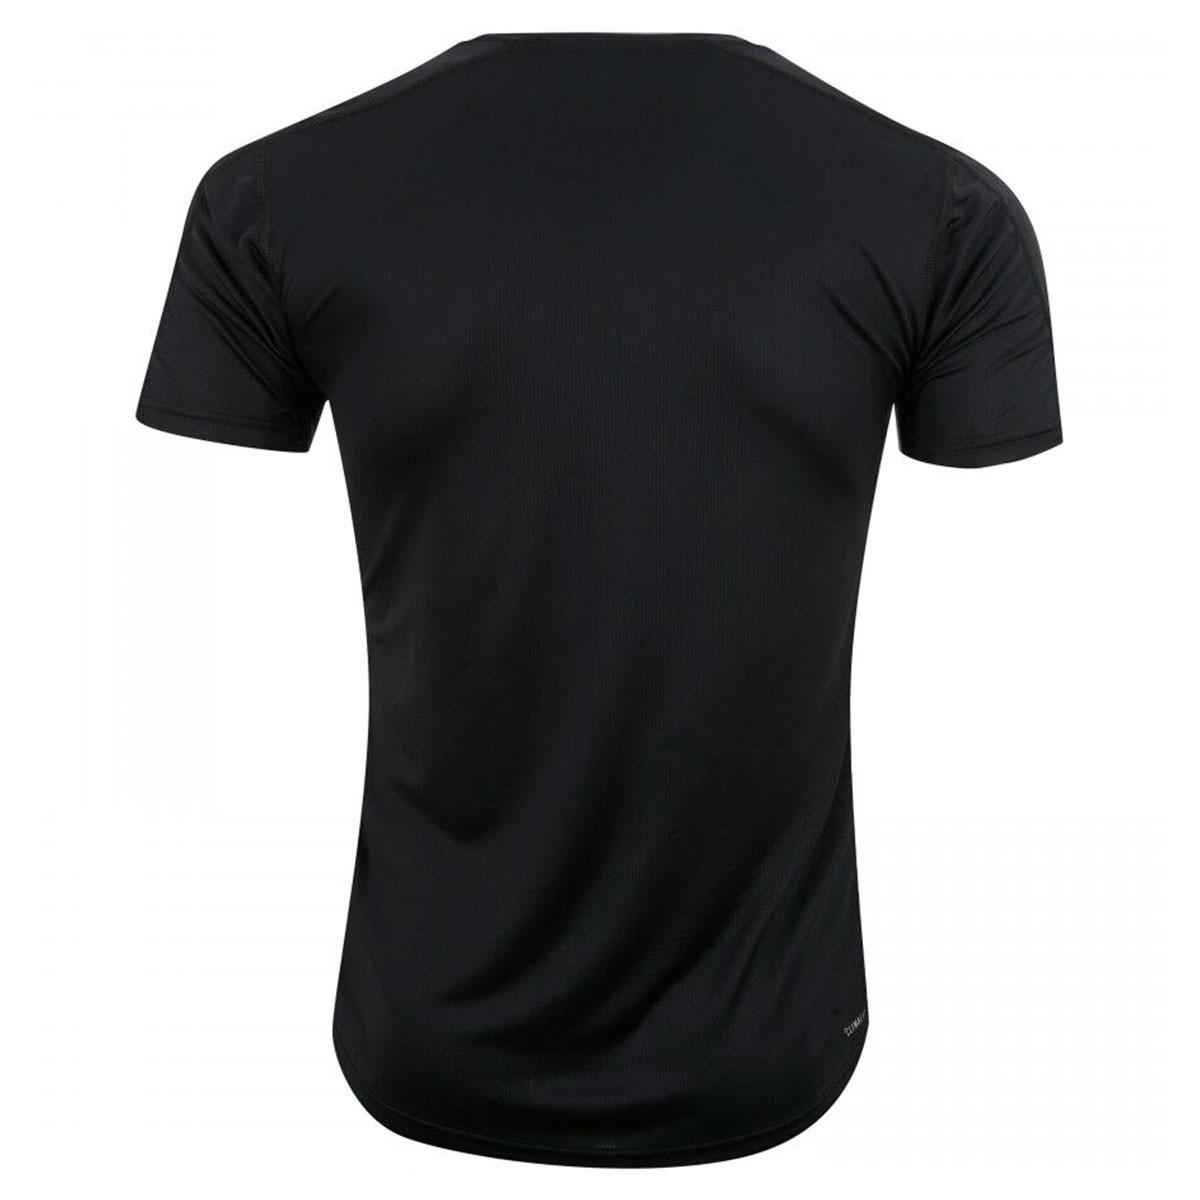 Camiseta Adidas D2M 3S Masculino - Preto